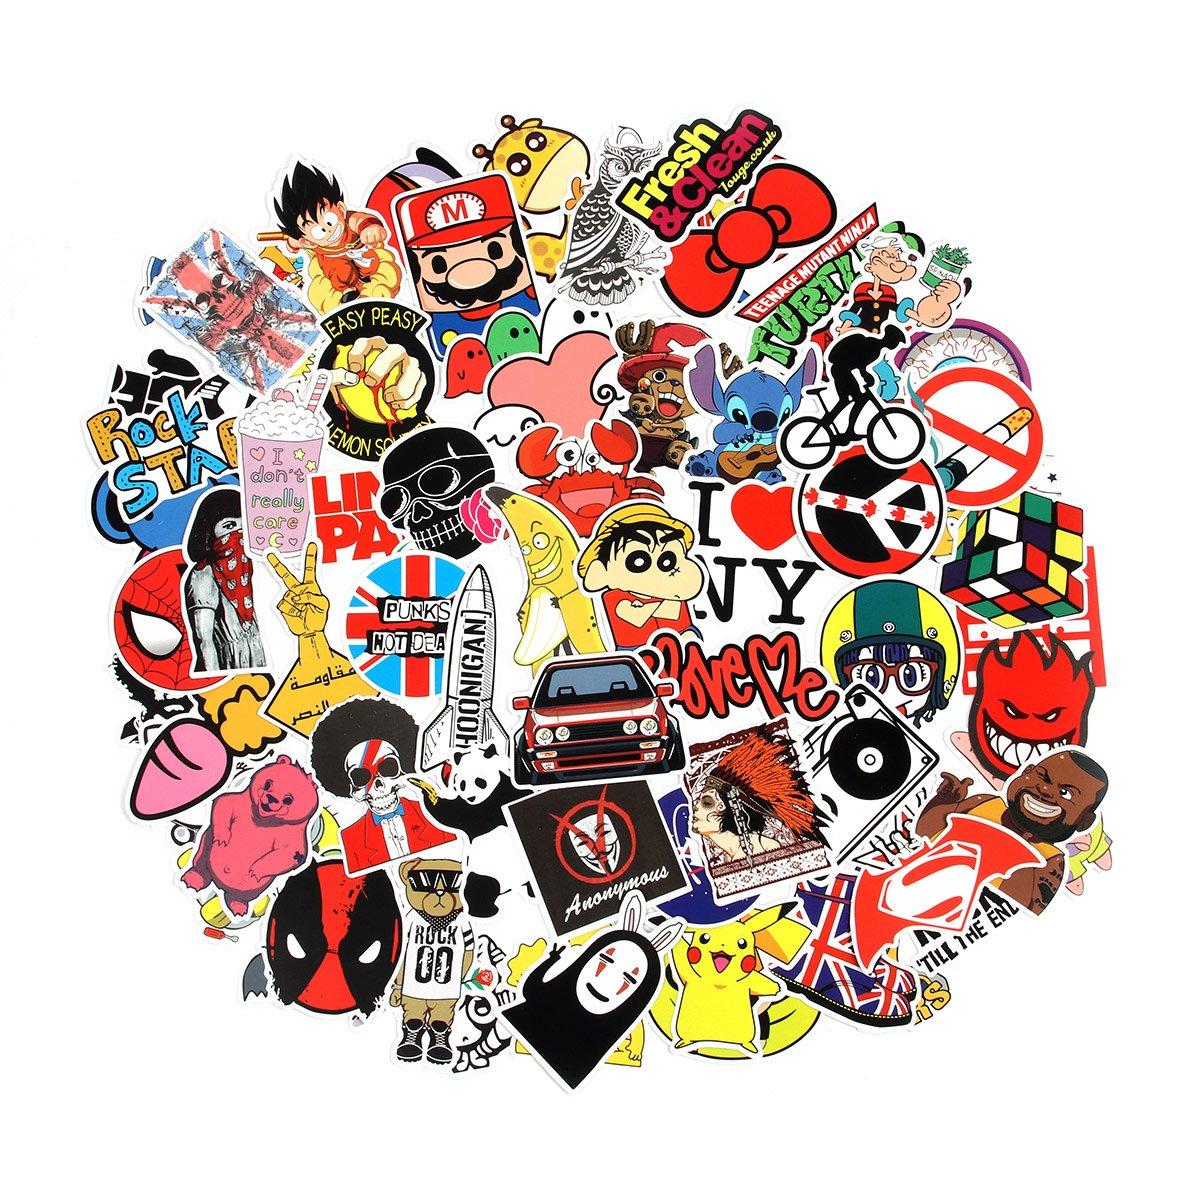 Stickers Calcos 100 un. Surtidos Origen U.S.A. (741XQWG9)